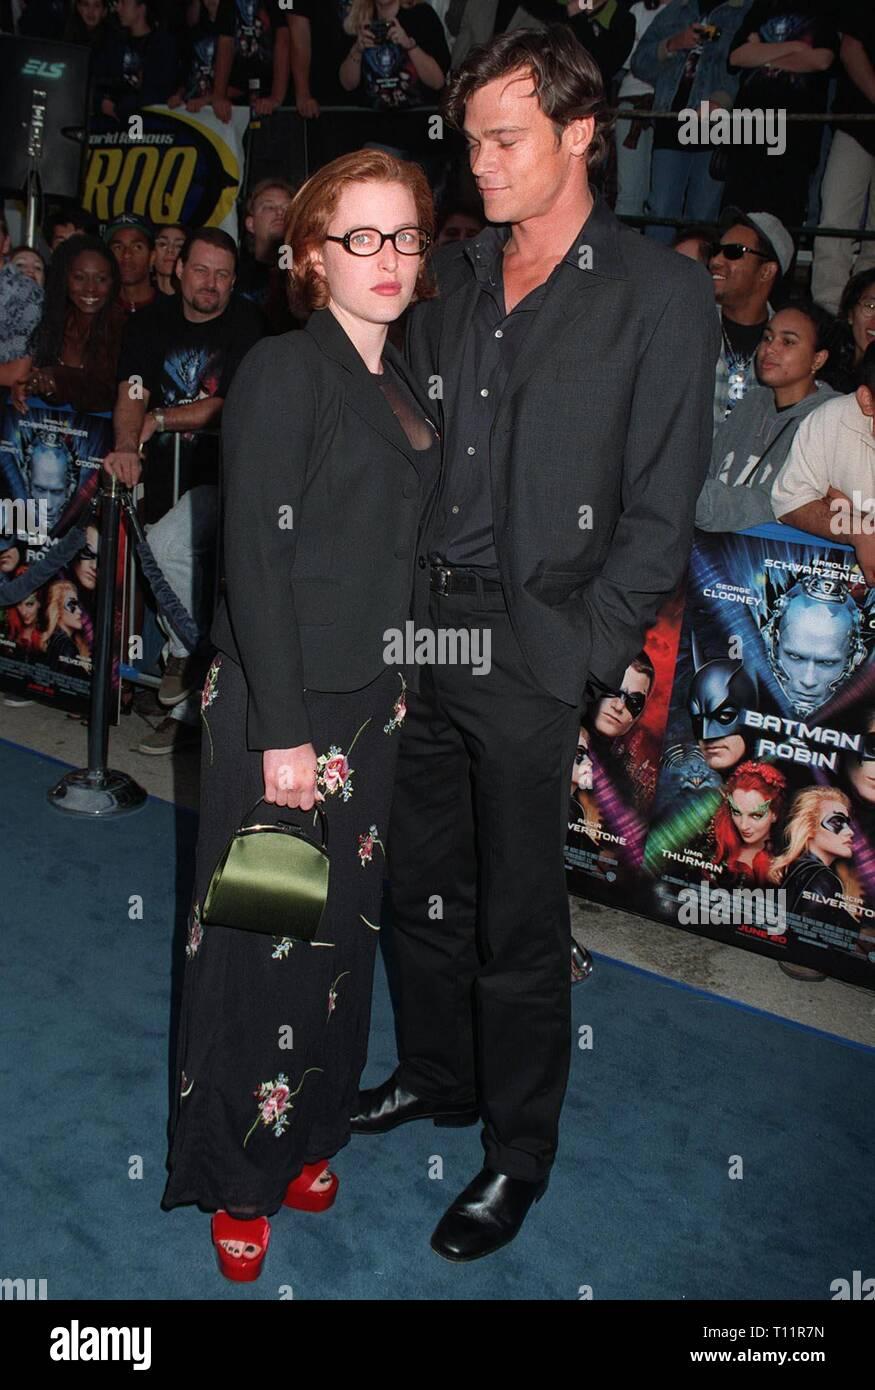 LOS ANGELES, CA. June 12, 1997: 'X-Files' star Gillian Anderson & boyfriend Rod Rowland at the World Premiere of 'Batman & Robin' in Los Angeles. - Stock Image